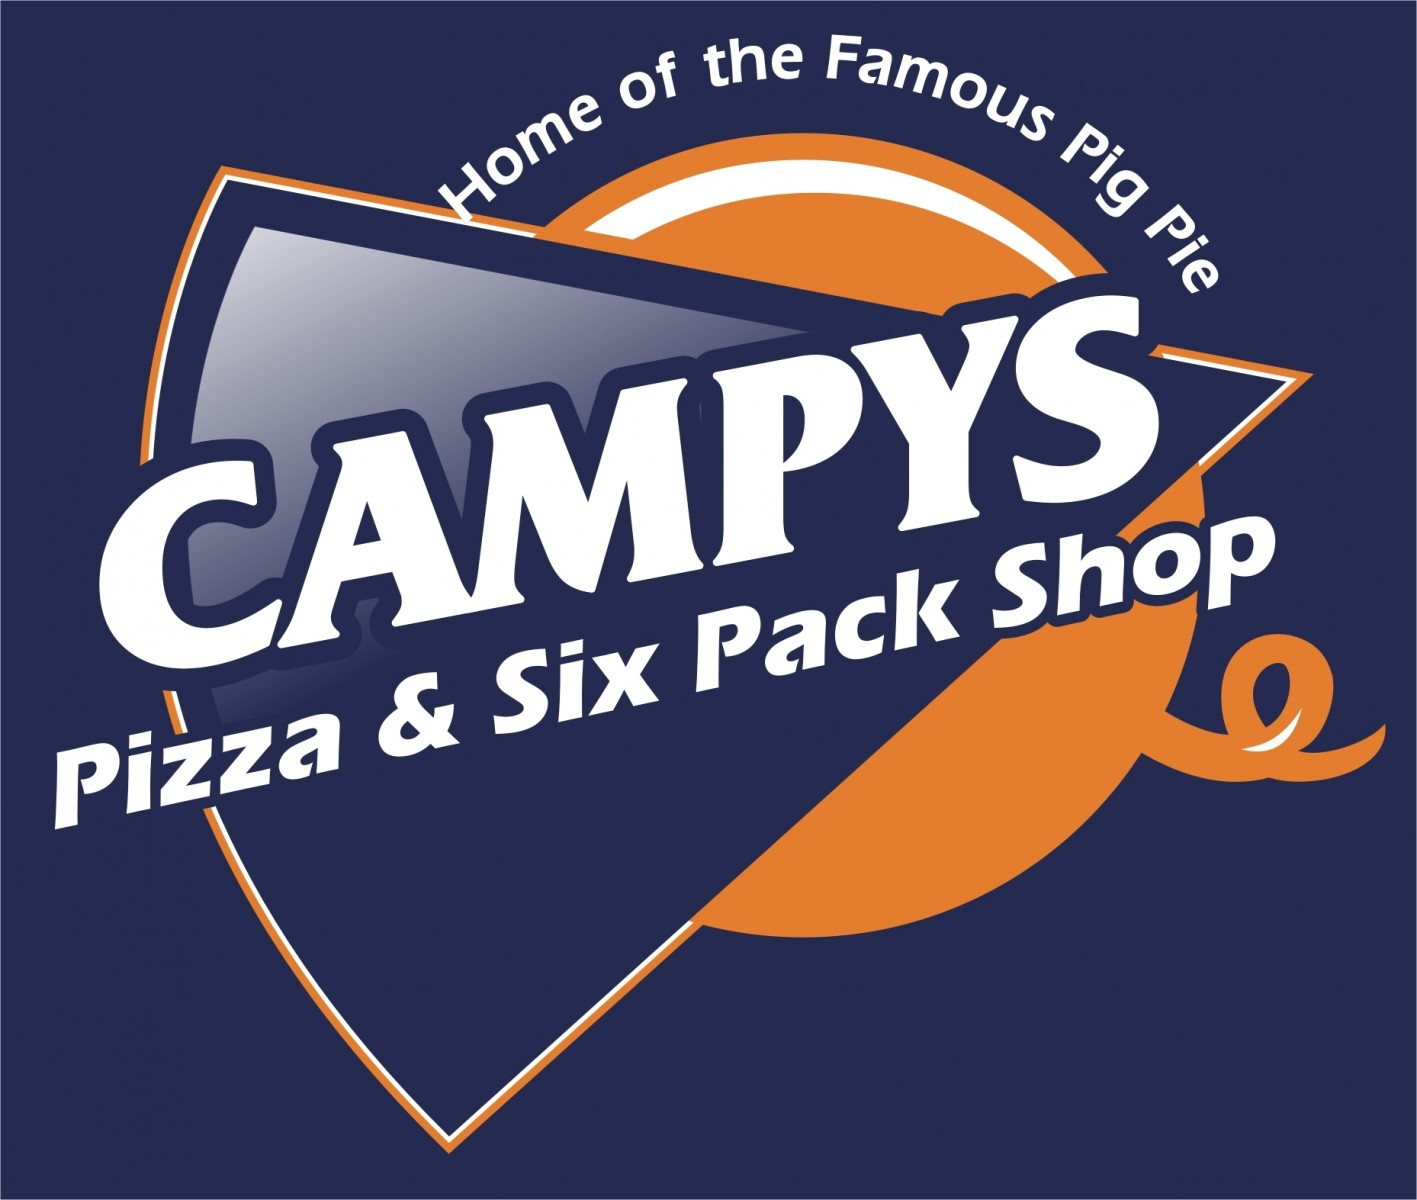 Campy's Pizza